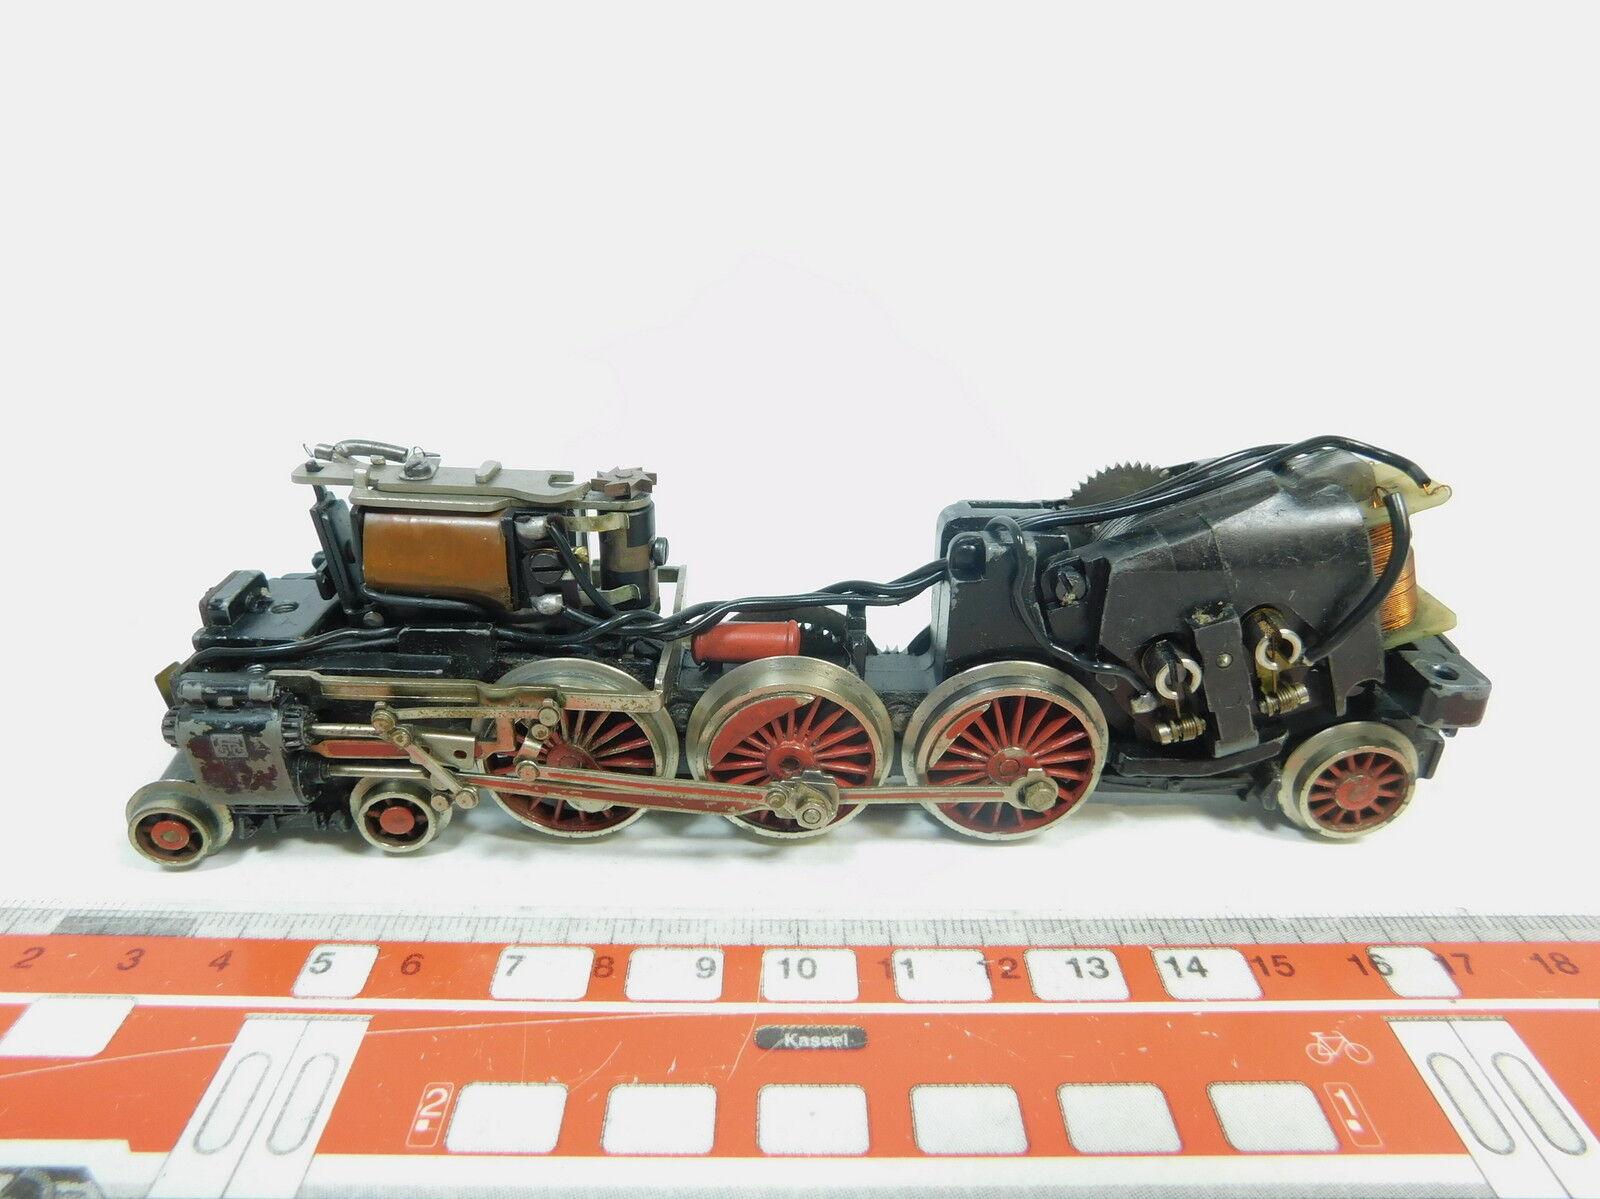 AZ653-1  Märklin Marklin H0 AC Chassis for Steam Locomotive F 800 F800 01